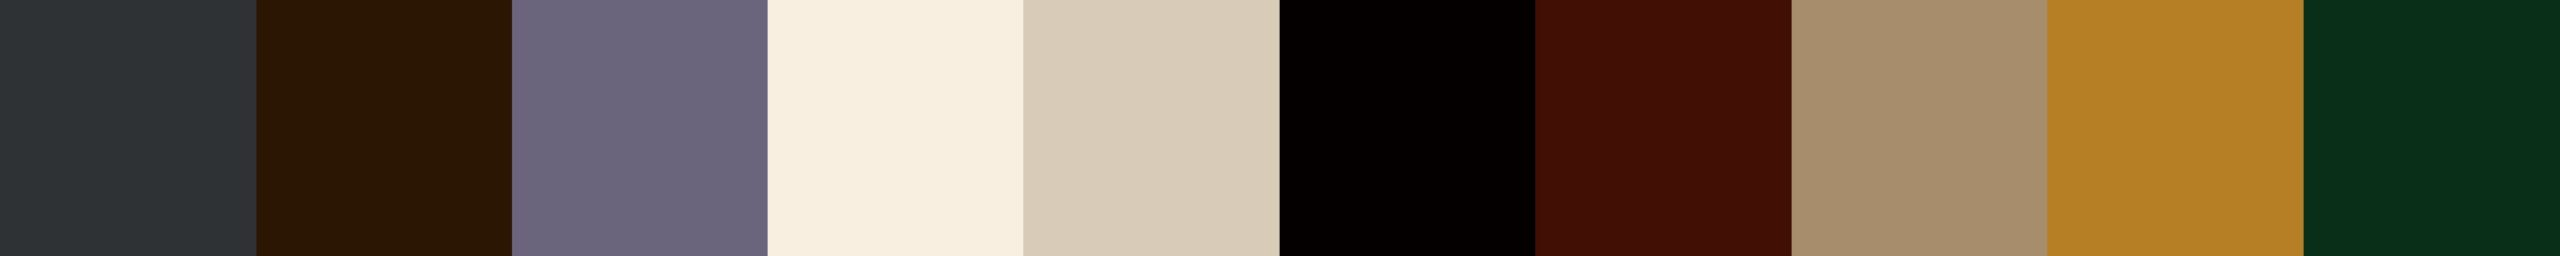 144 Dernovieta Color Palette